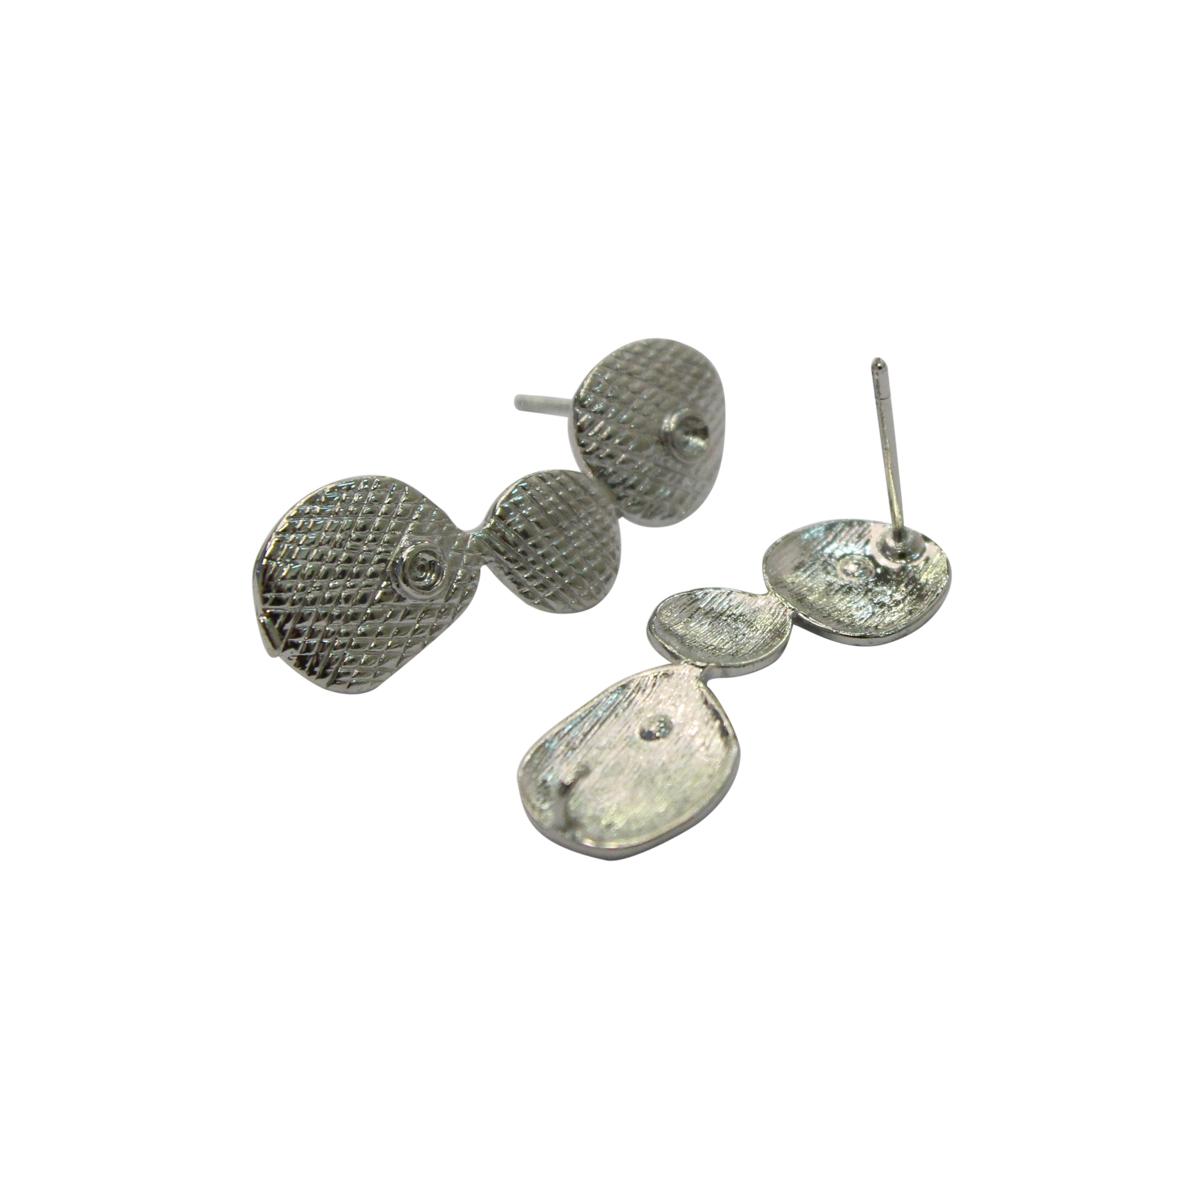 54-P7772 Основа для серег, 10*25 мм, упак./2 шт., 'Астра'